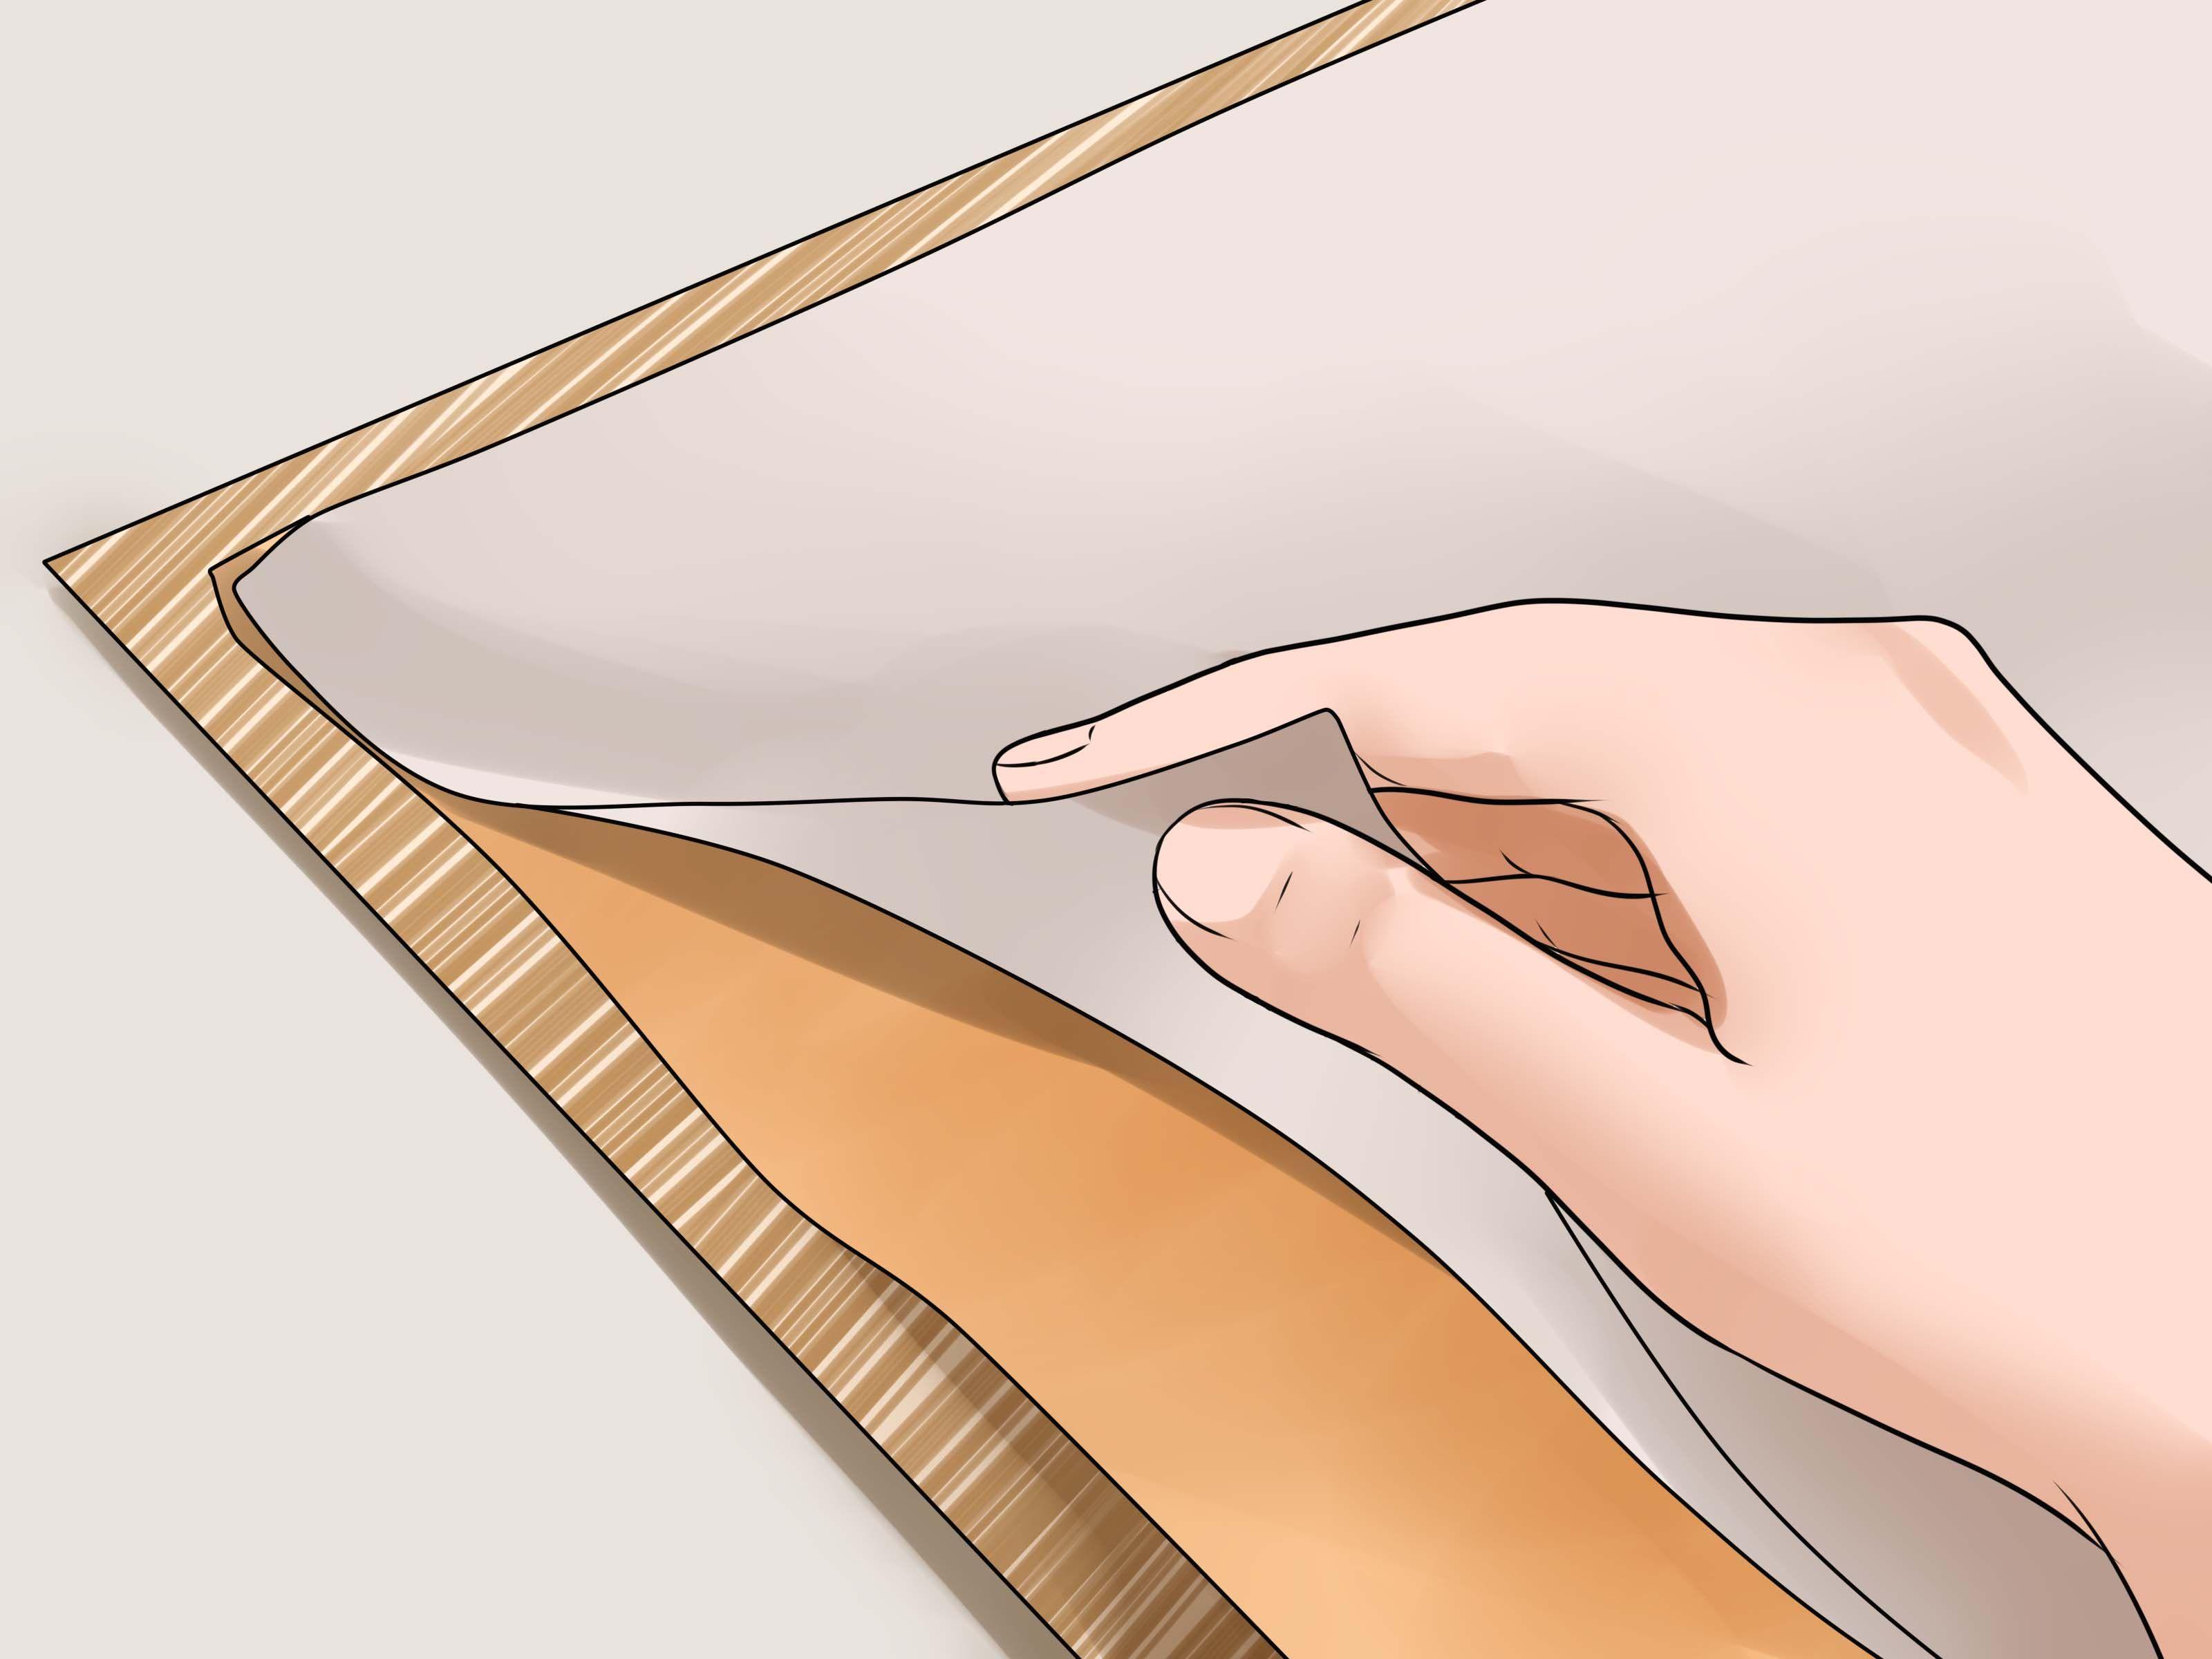 How to fiberglass how to fiberglass fiberglass mold